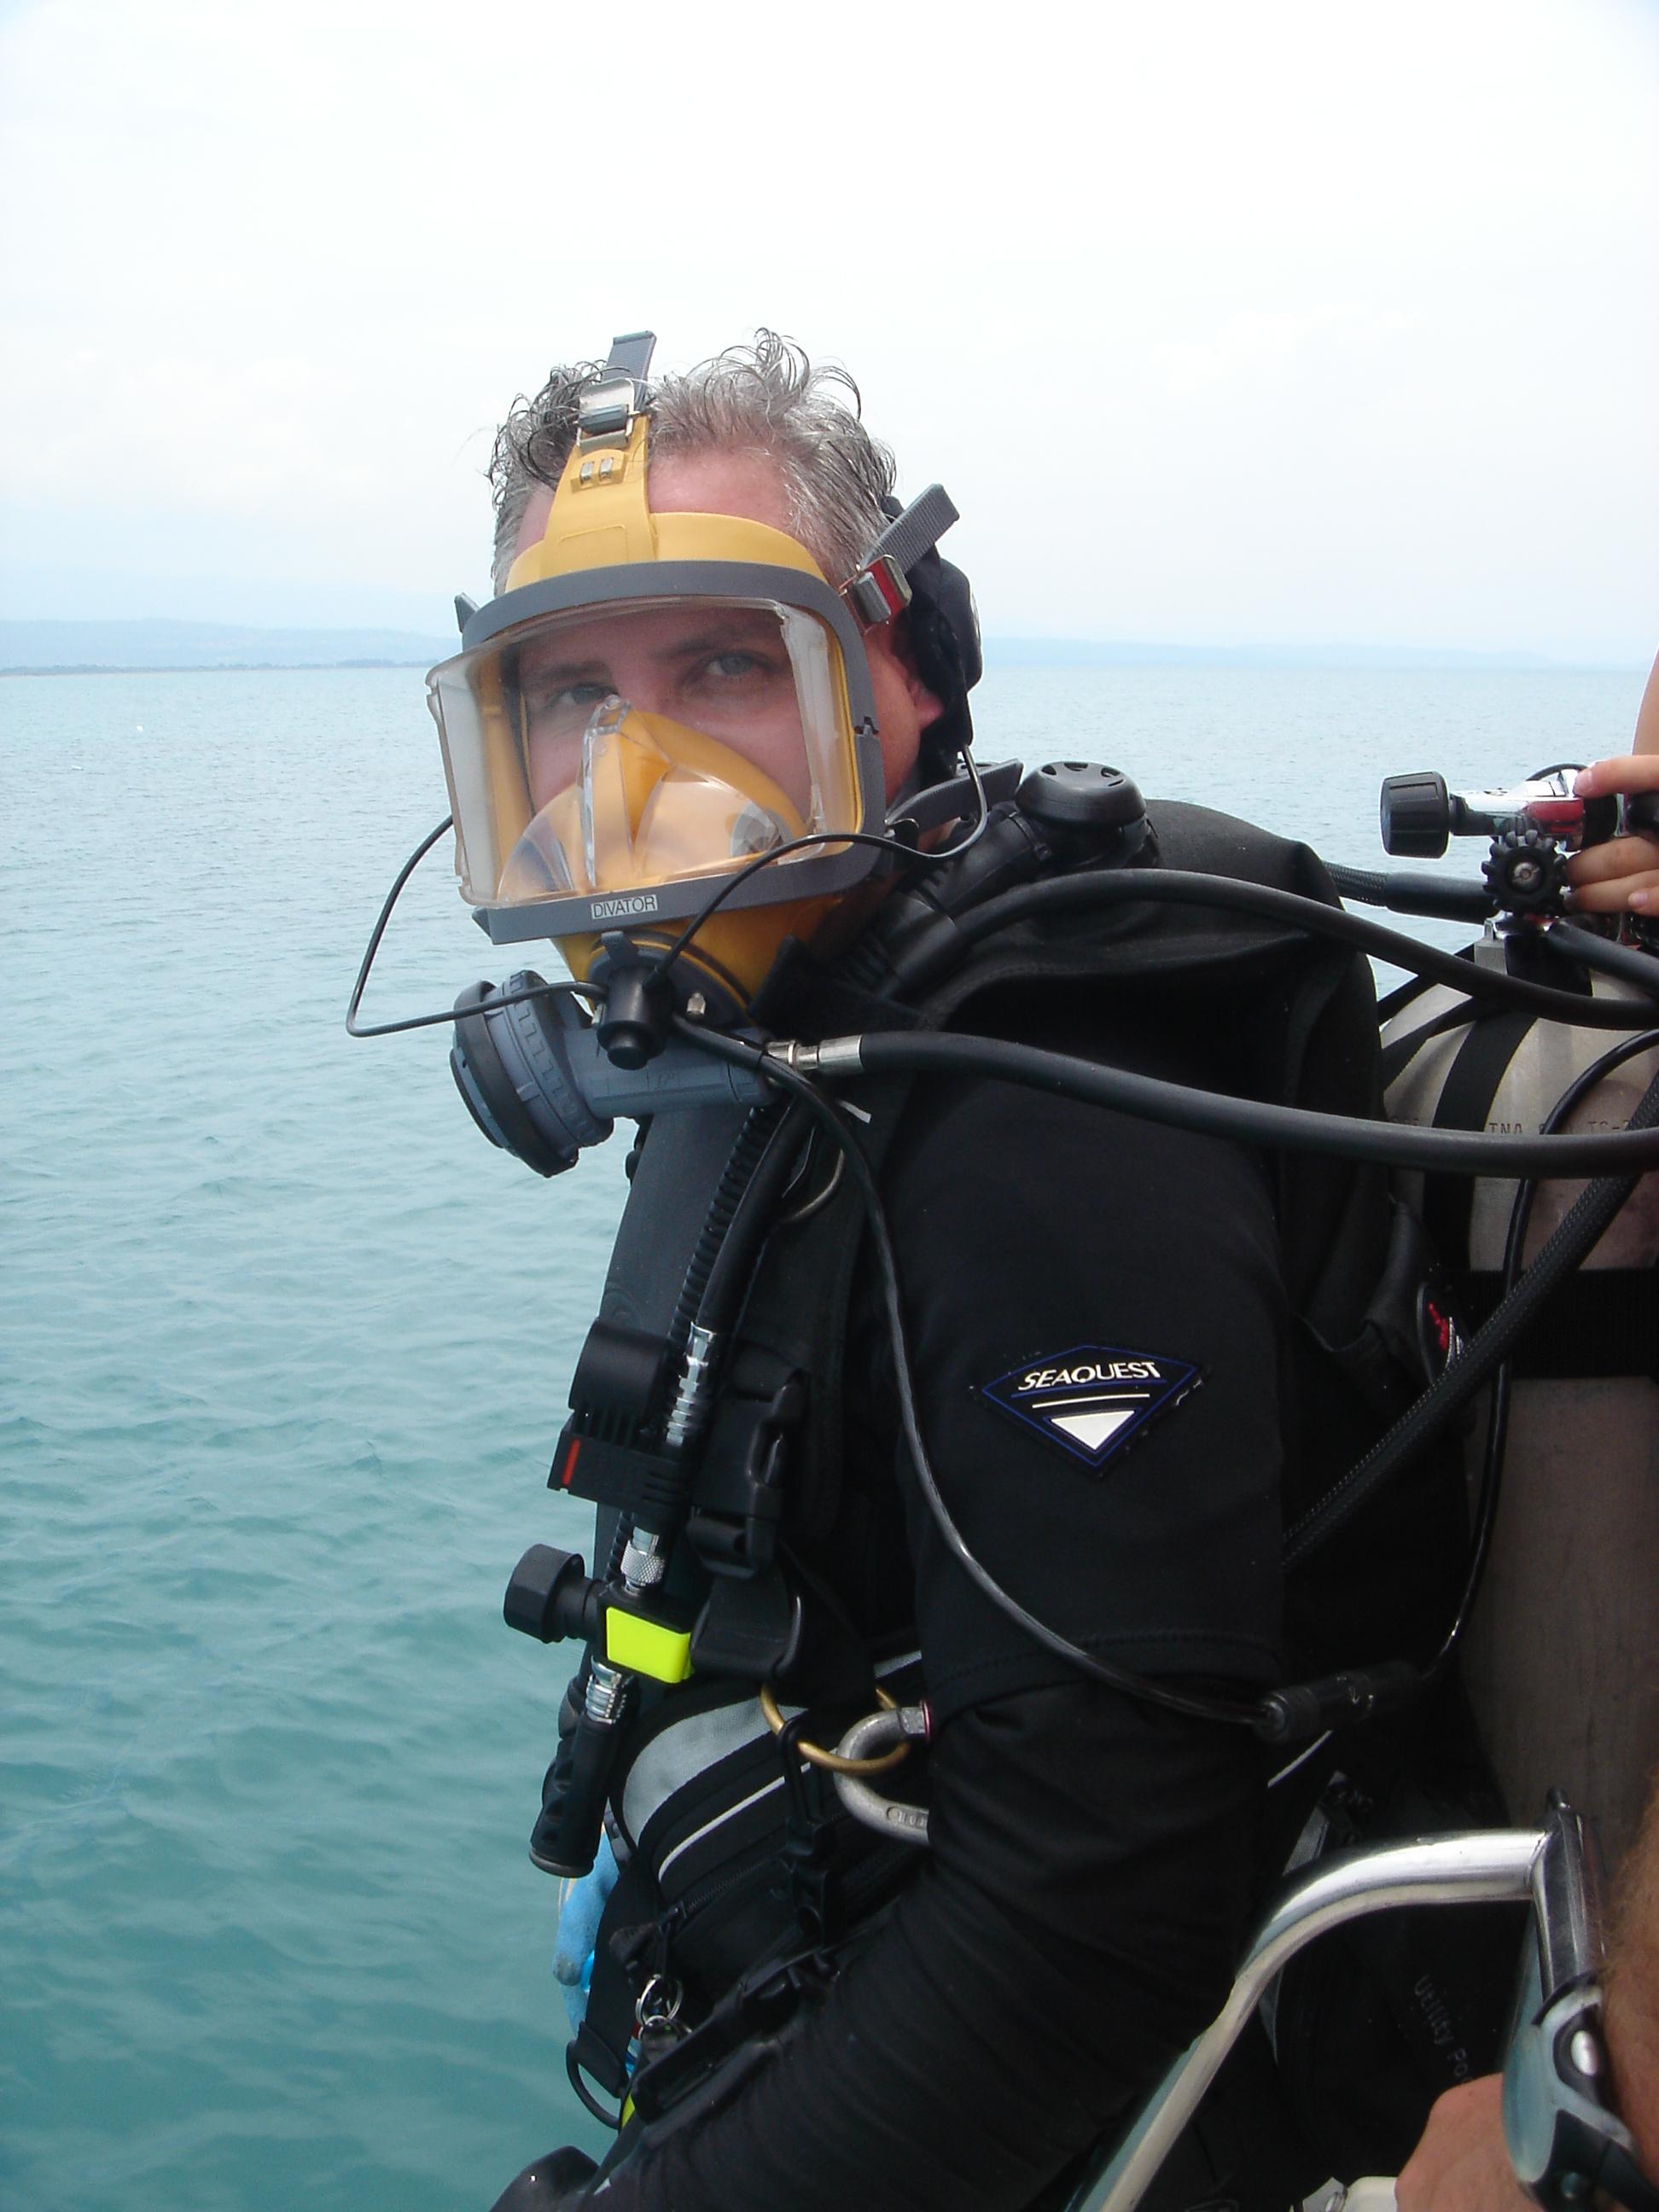 Capt (Rtd) Patrick Enlow on the Isabella Survey